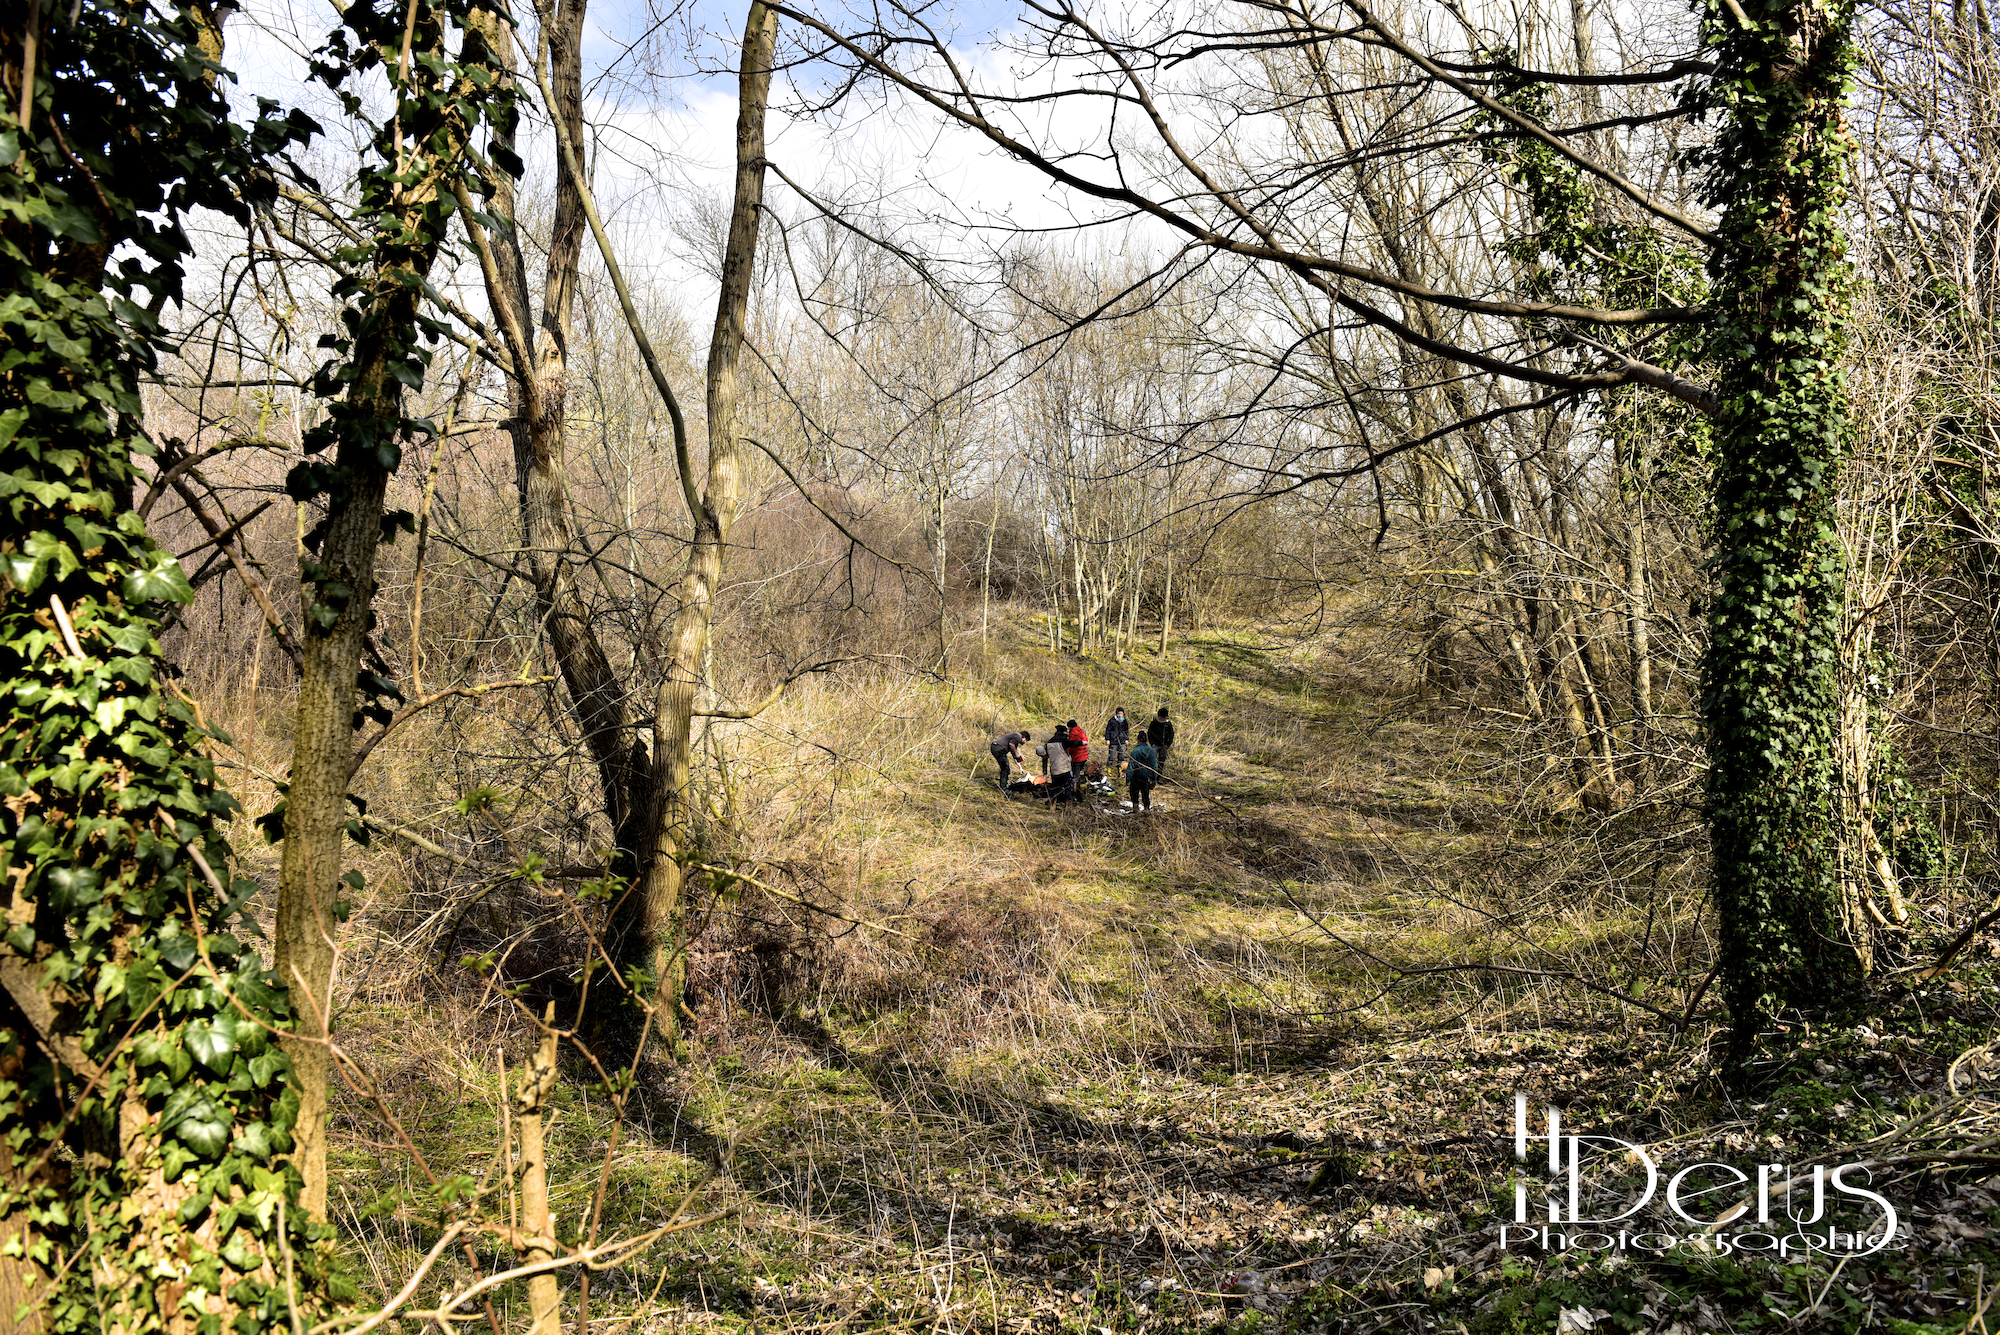 11-03-16 - Carottage du Lac de Gergovie - Henri Derus Photographie 042